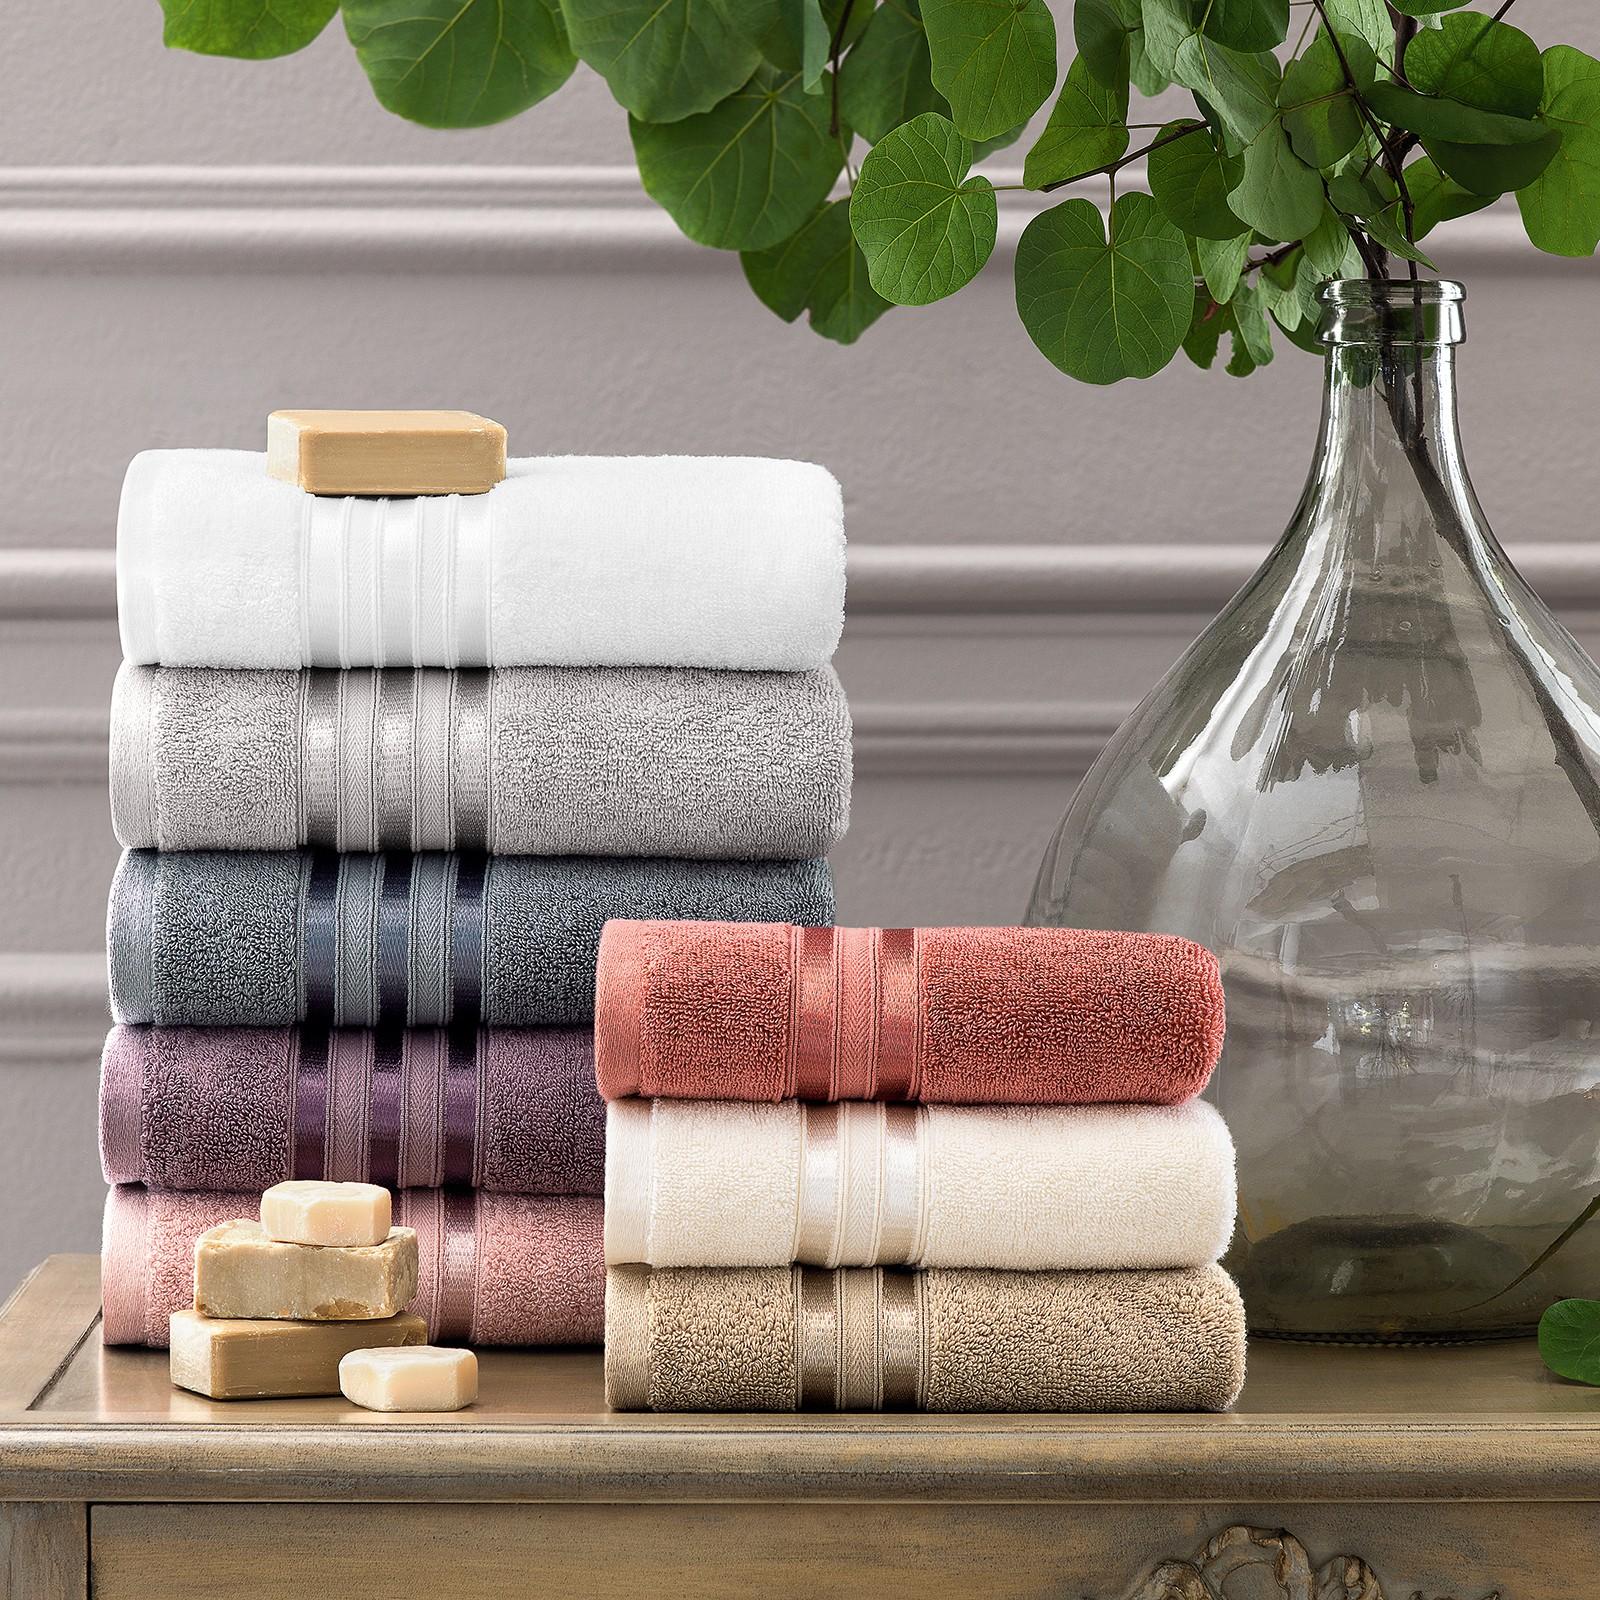 Полотенца Togas Полотенце Аркадия Цвет: Белый (100х150 см) полотенце 100 100 см авангард